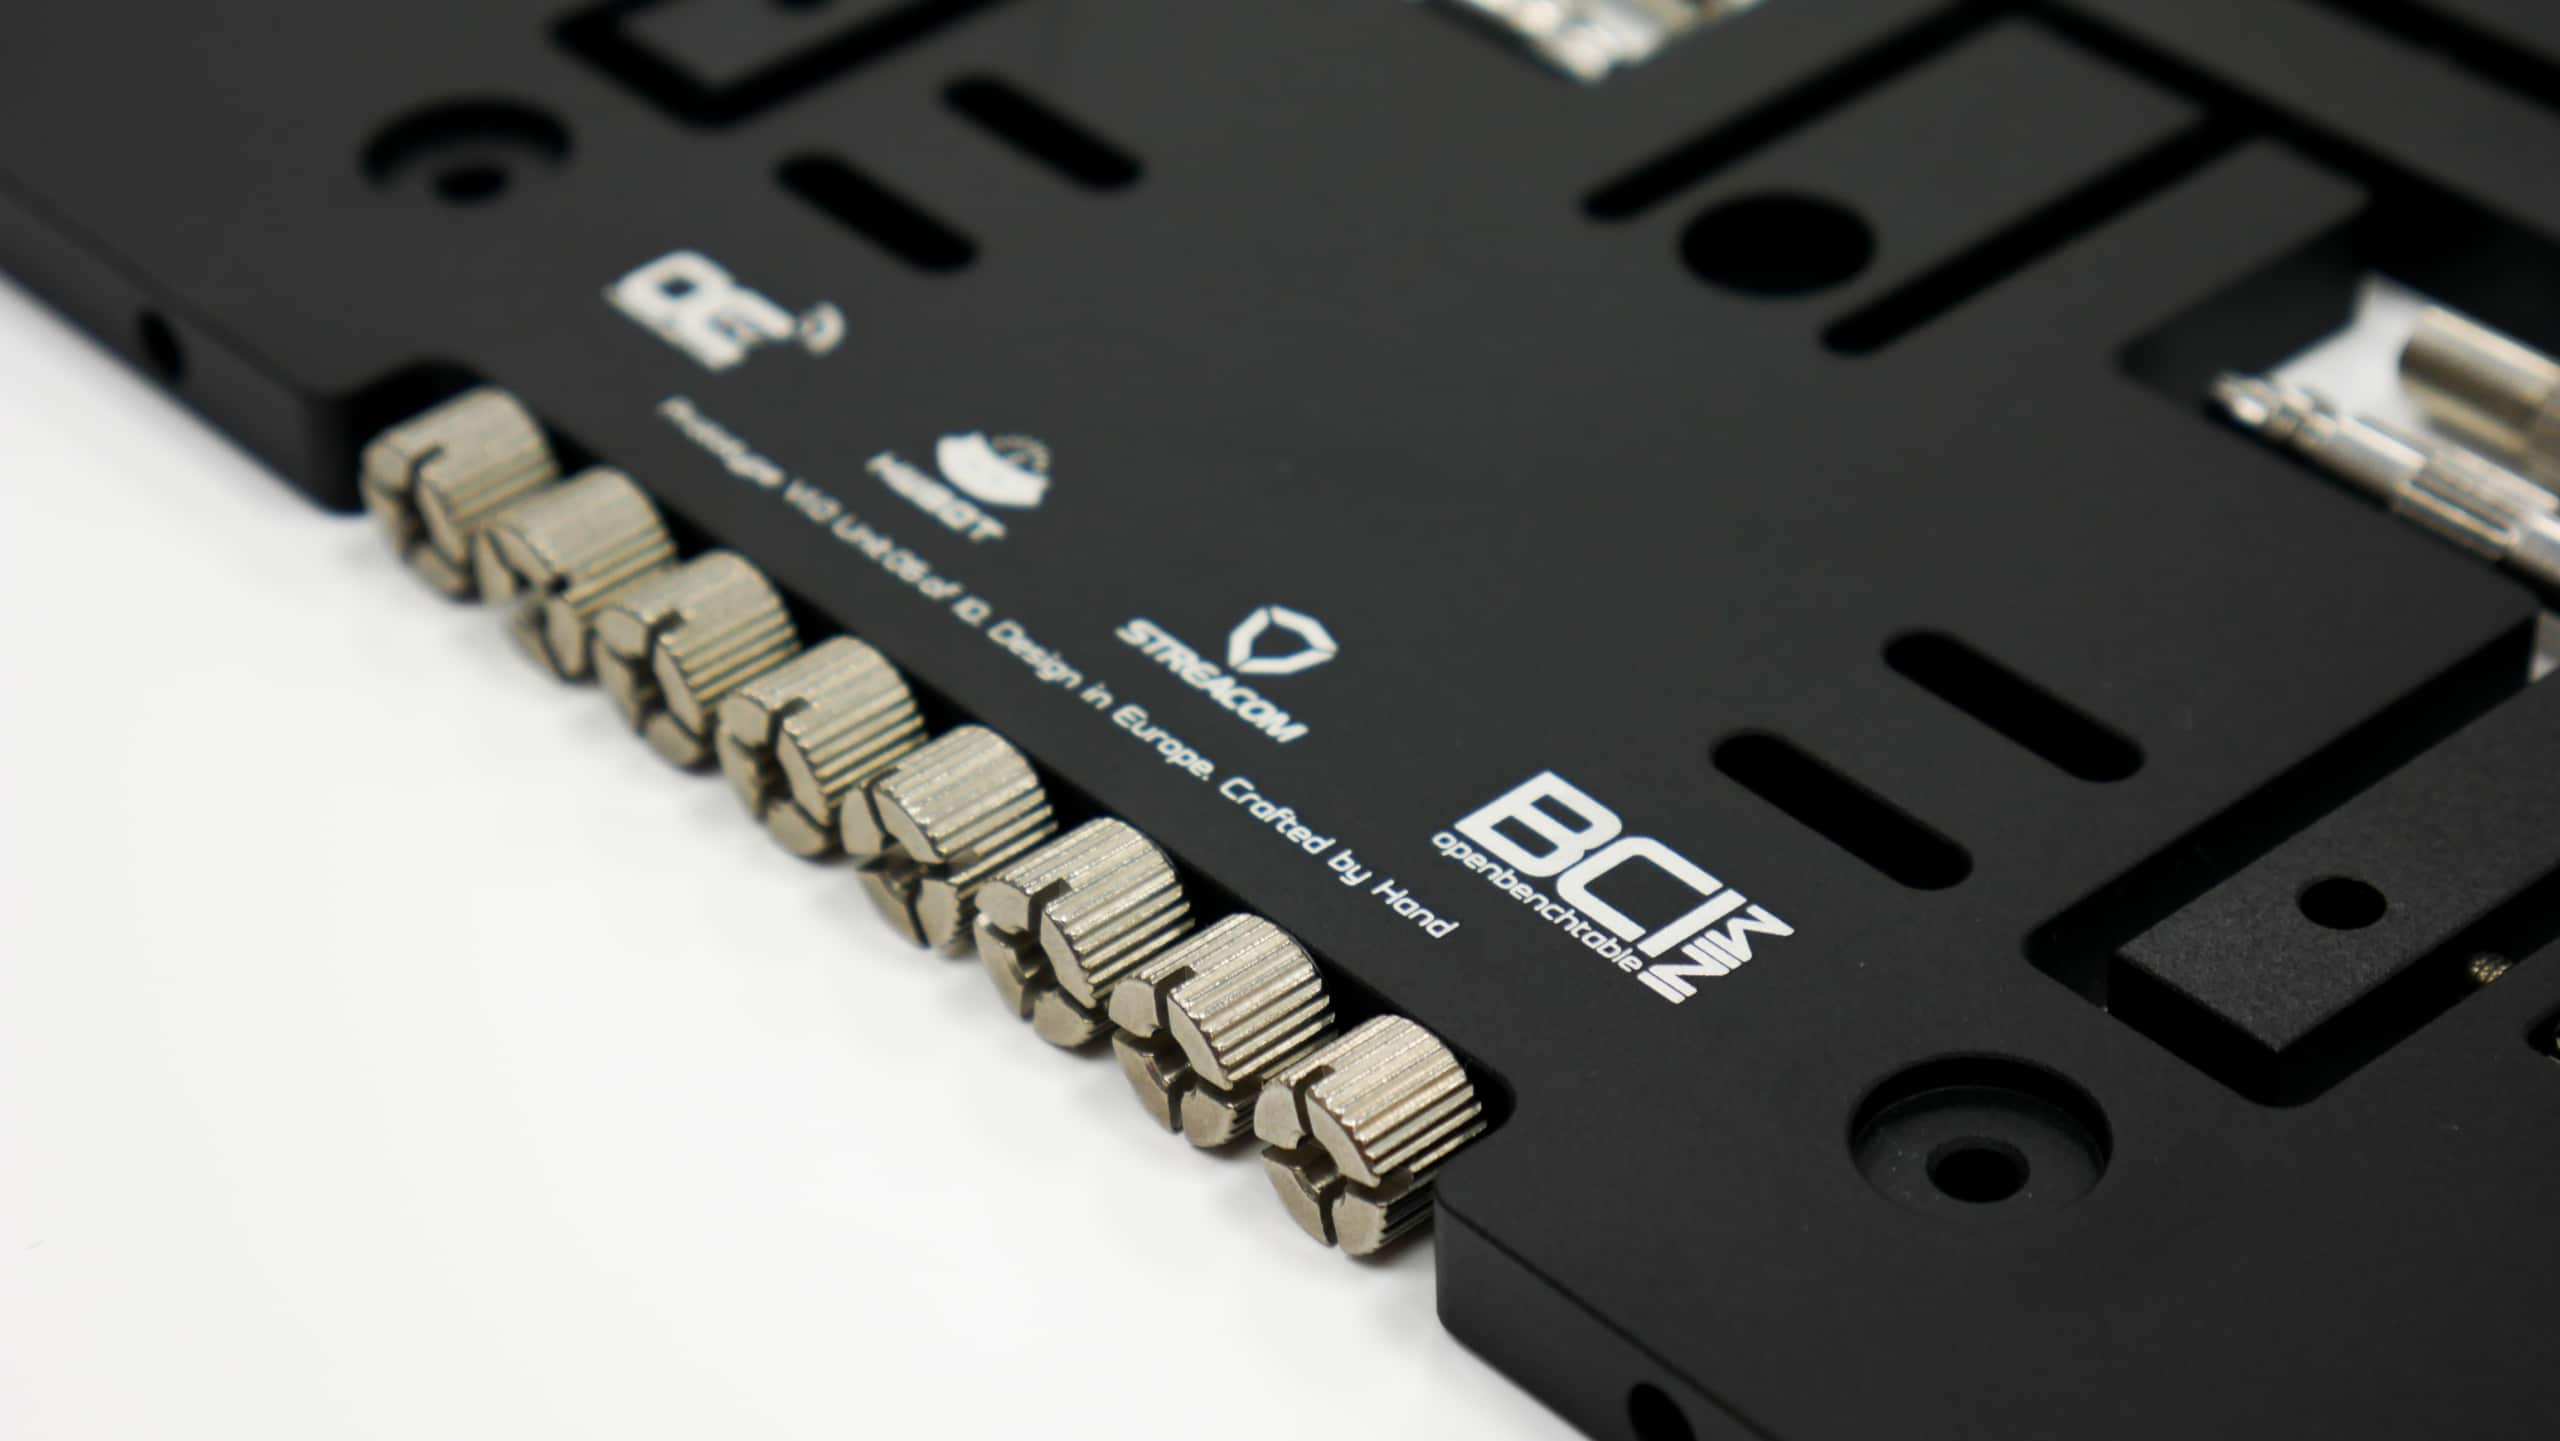 BC1-mini-prototype-logo-all-folded